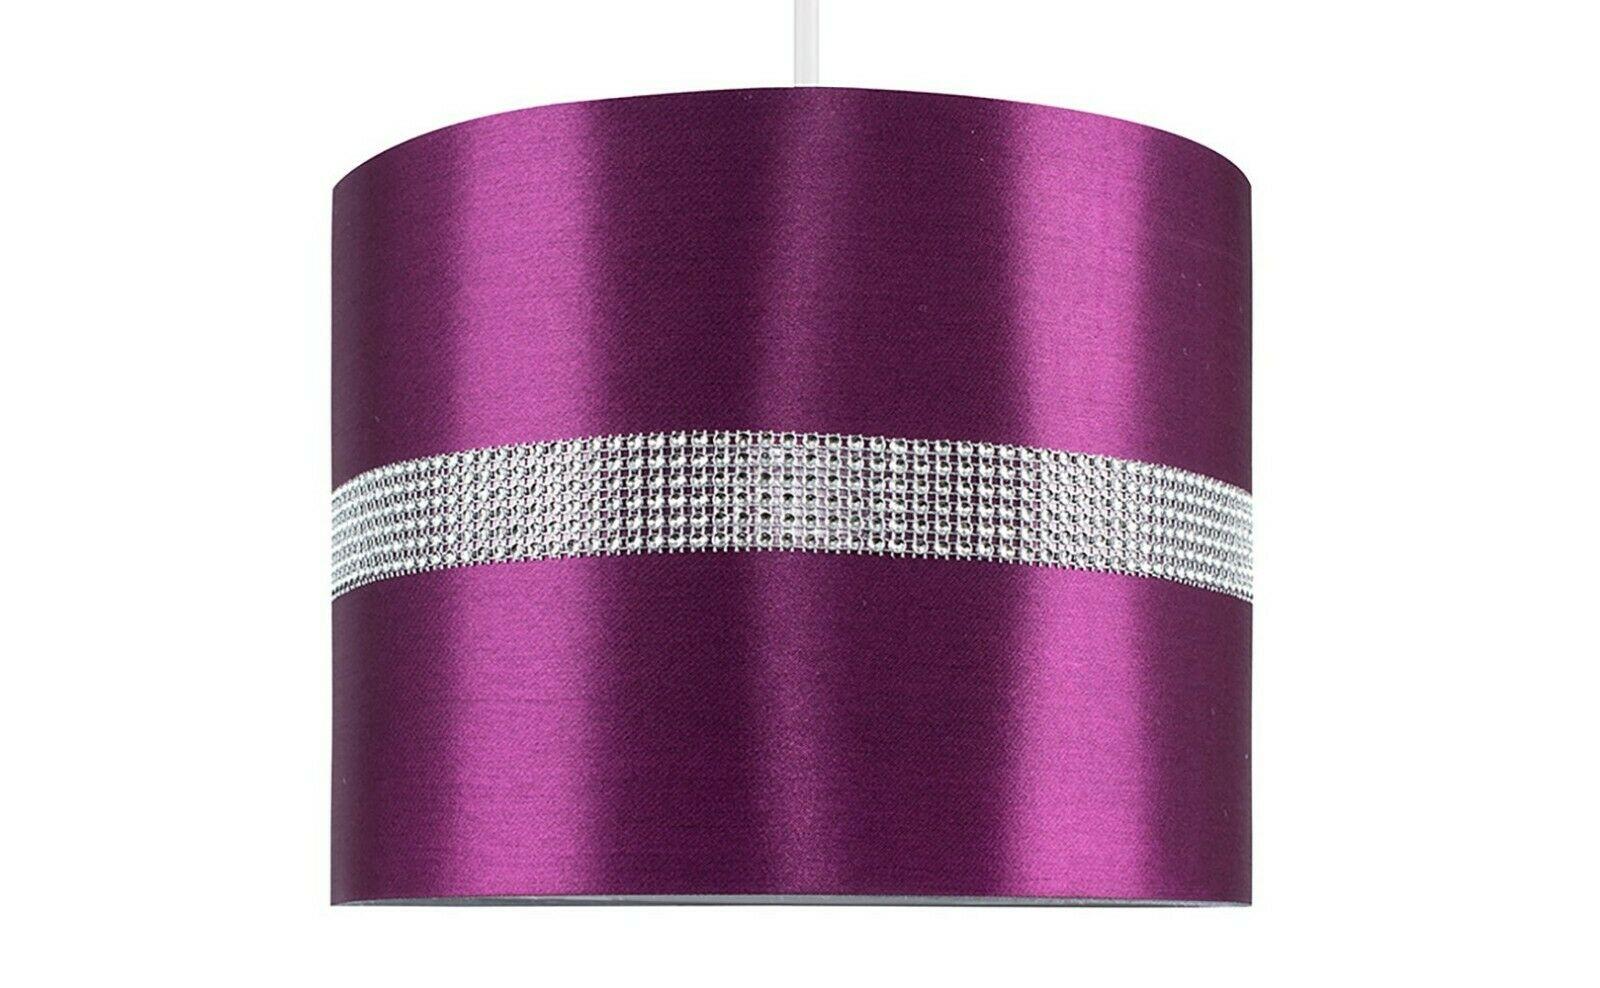 Diamante-Algodon-Tela-no-electricas-Tambor-tonos-de-mesa-o-lampara-de-pie-luz-Sombra miniatura 25